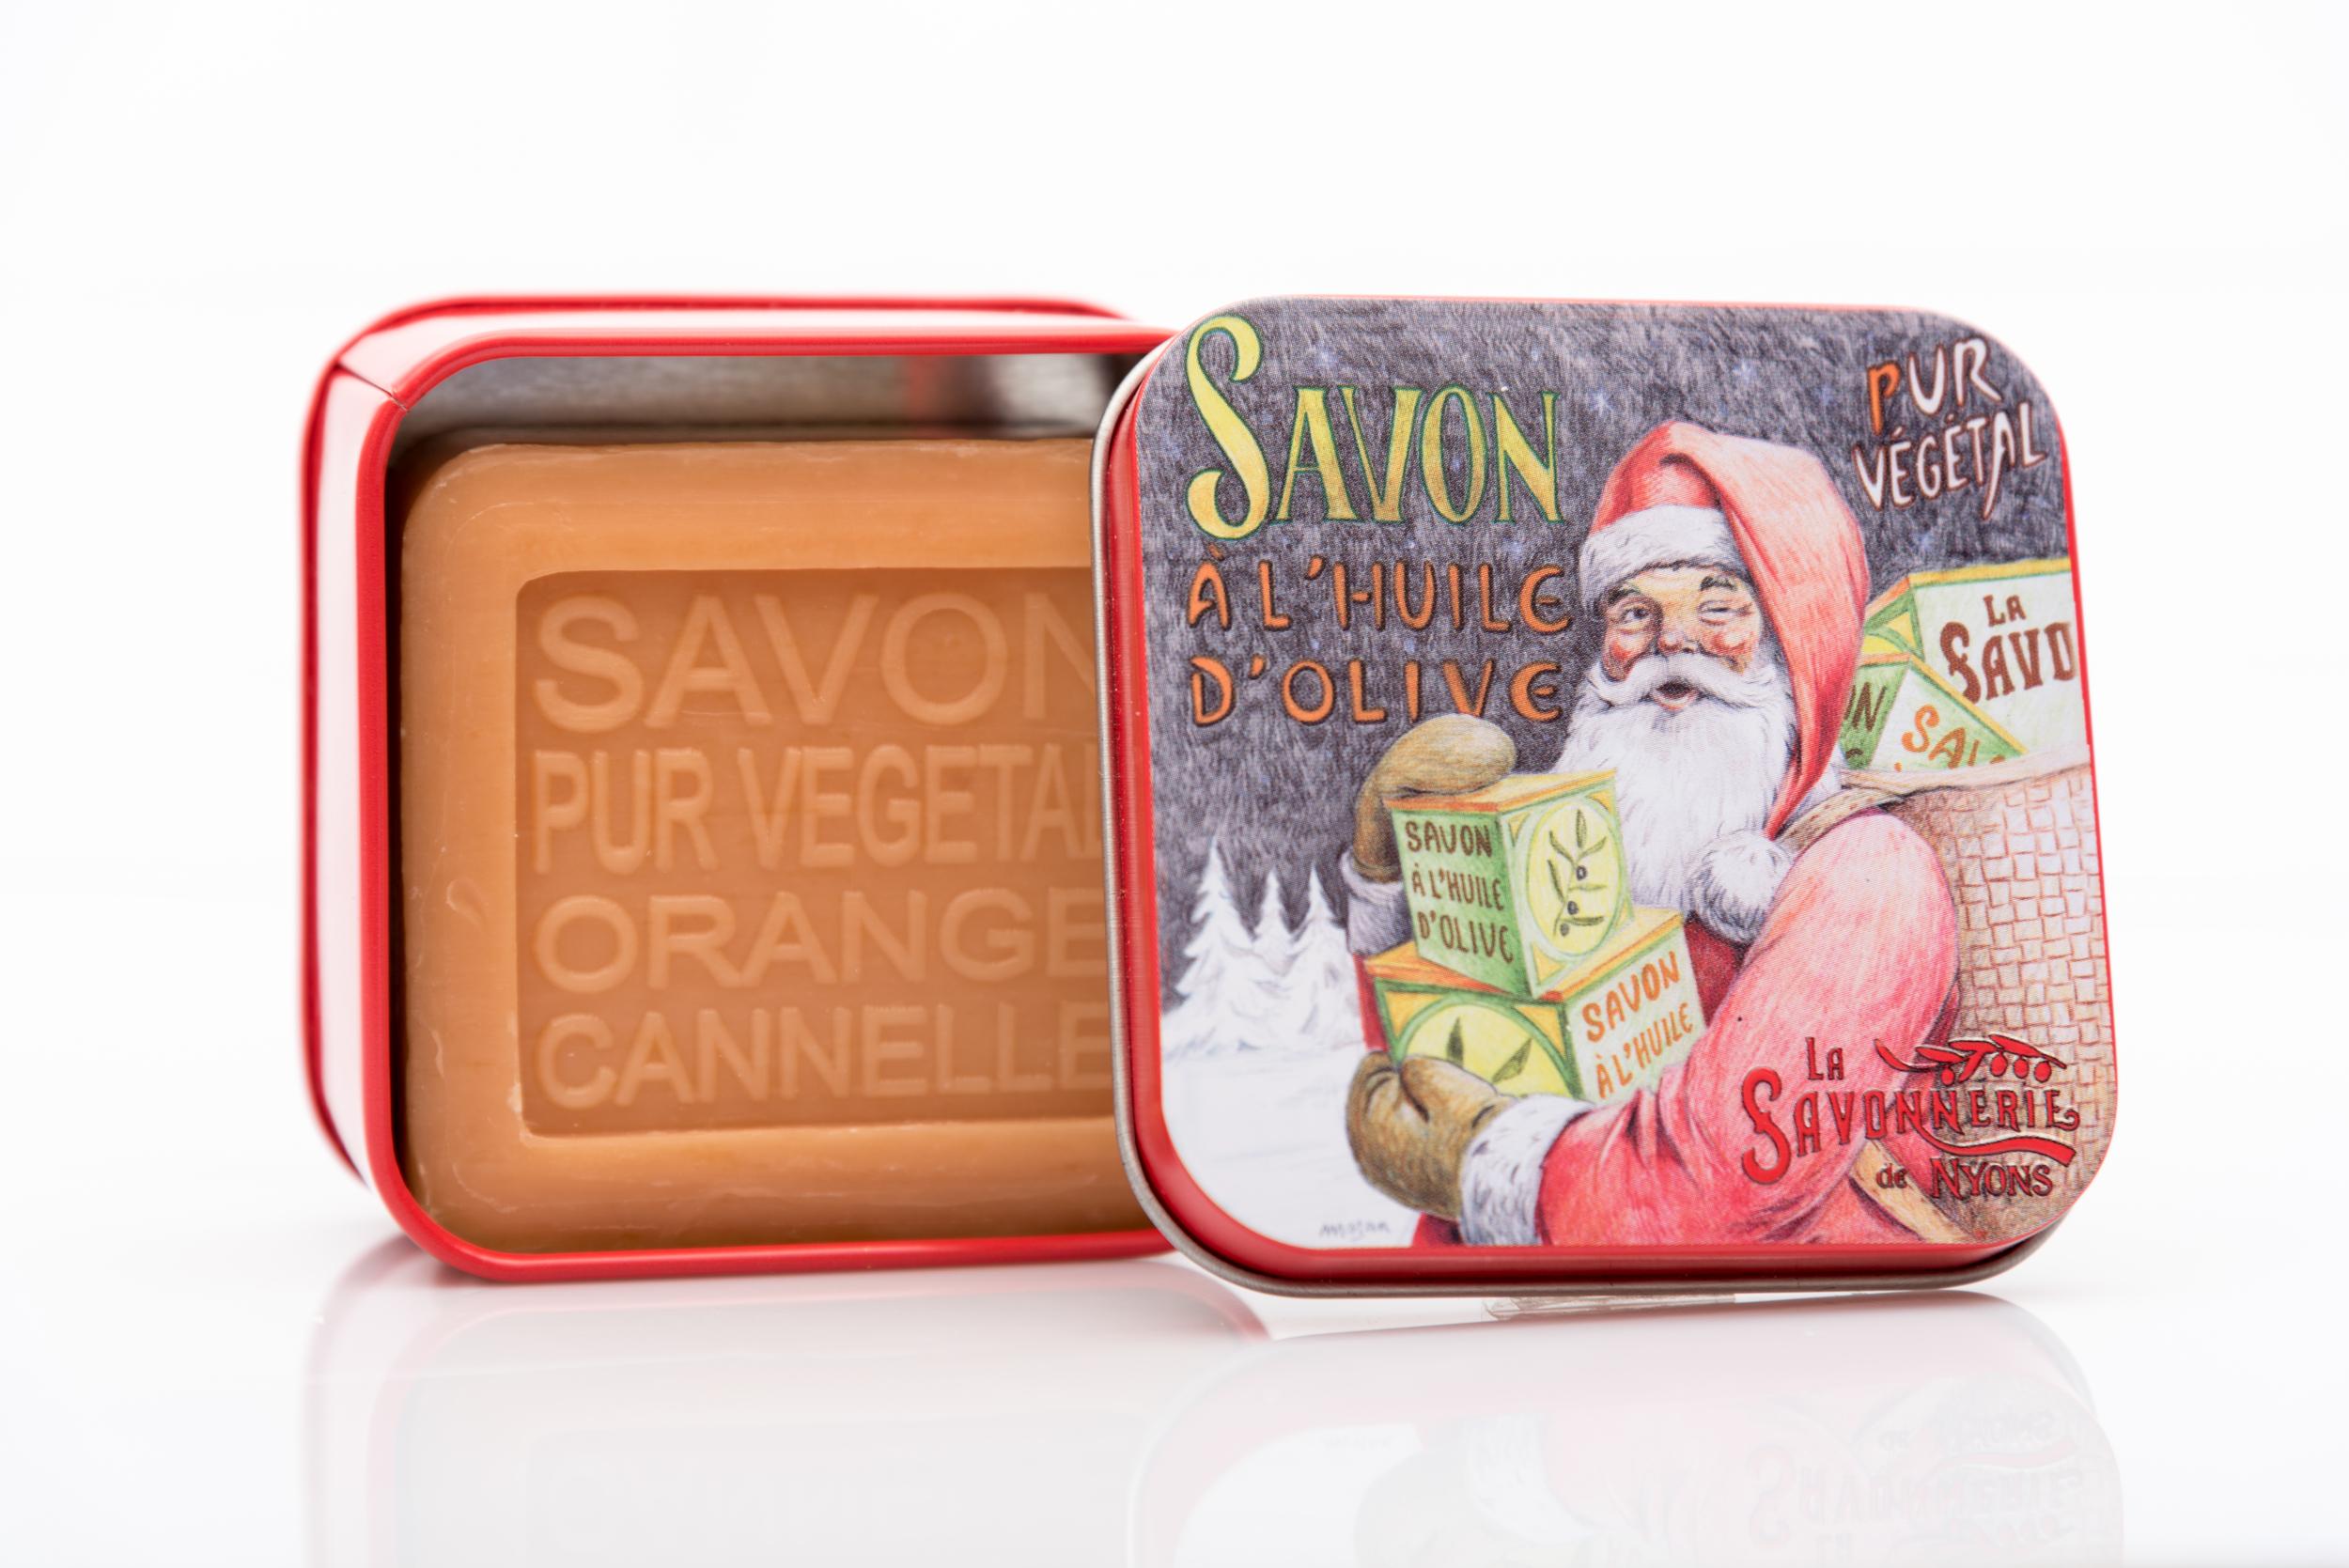 SAVON DE NYONS VEGETAL MADE IN FRANCE AVEC BOITE METALIQUE MODELE 53 ORANGE CANNELLE